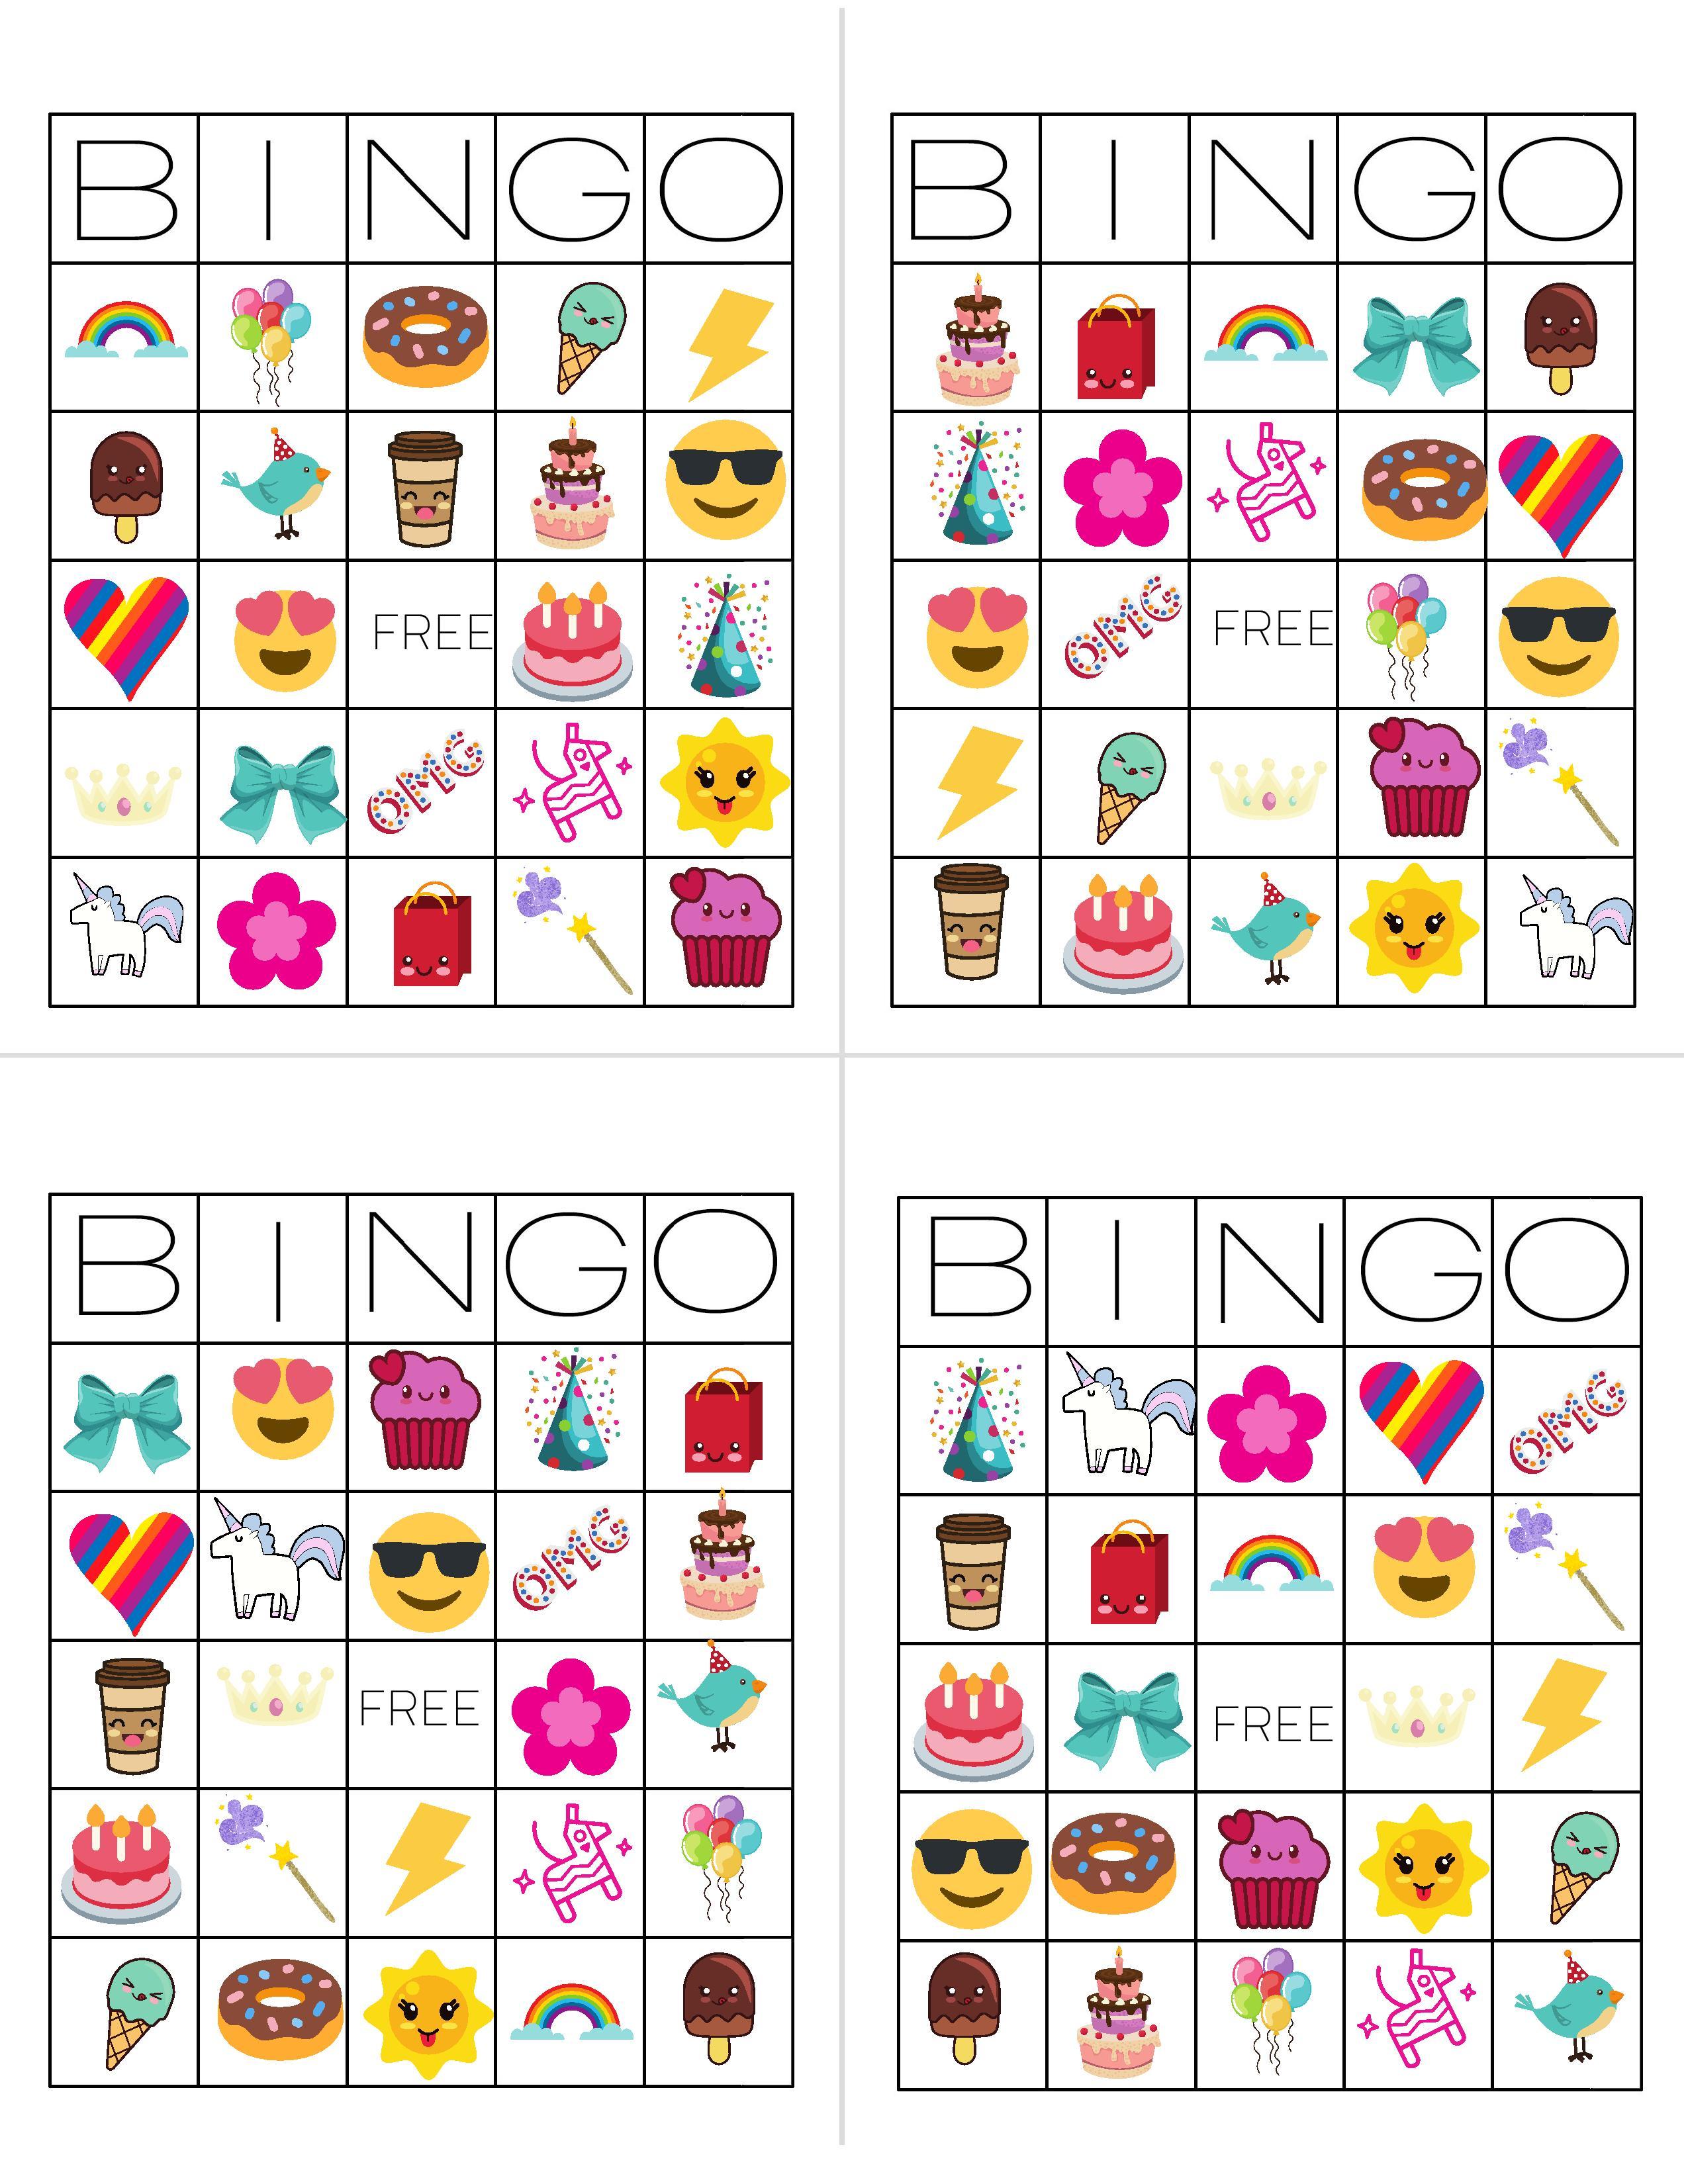 Unicorn Bingo Free Printable Download Tinselbox